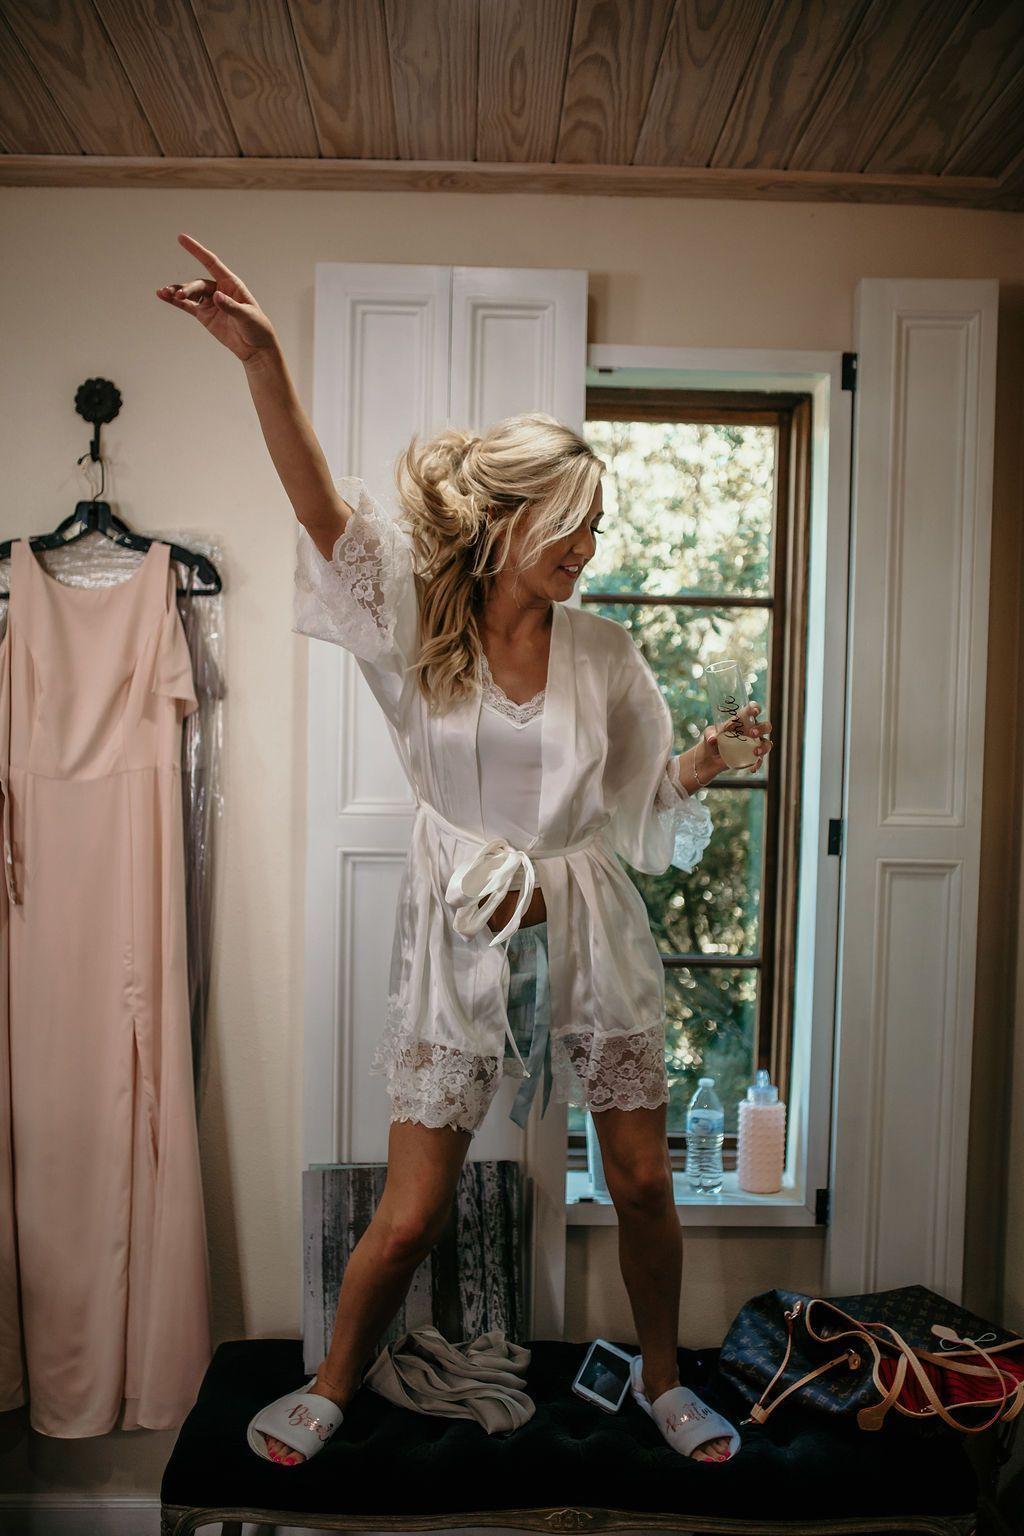 Woman dancing in a robe